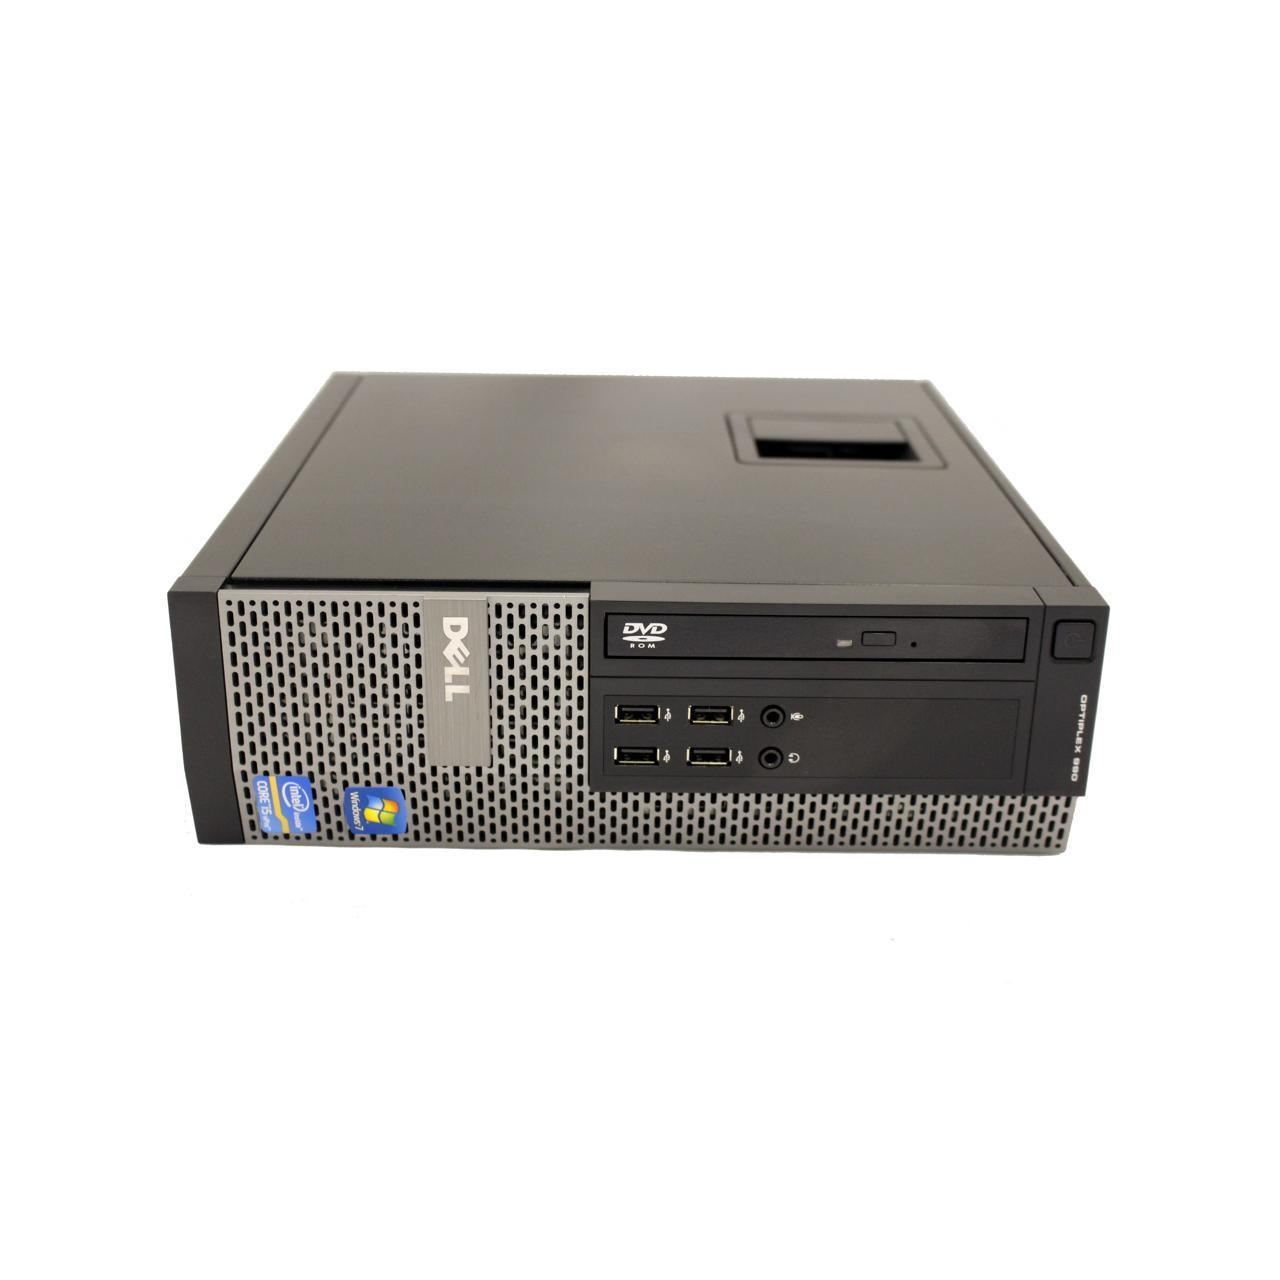 Dell OptiPlex 990 SFF Core i5 3,1 GHz - HDD 2 To RAM 16 Go